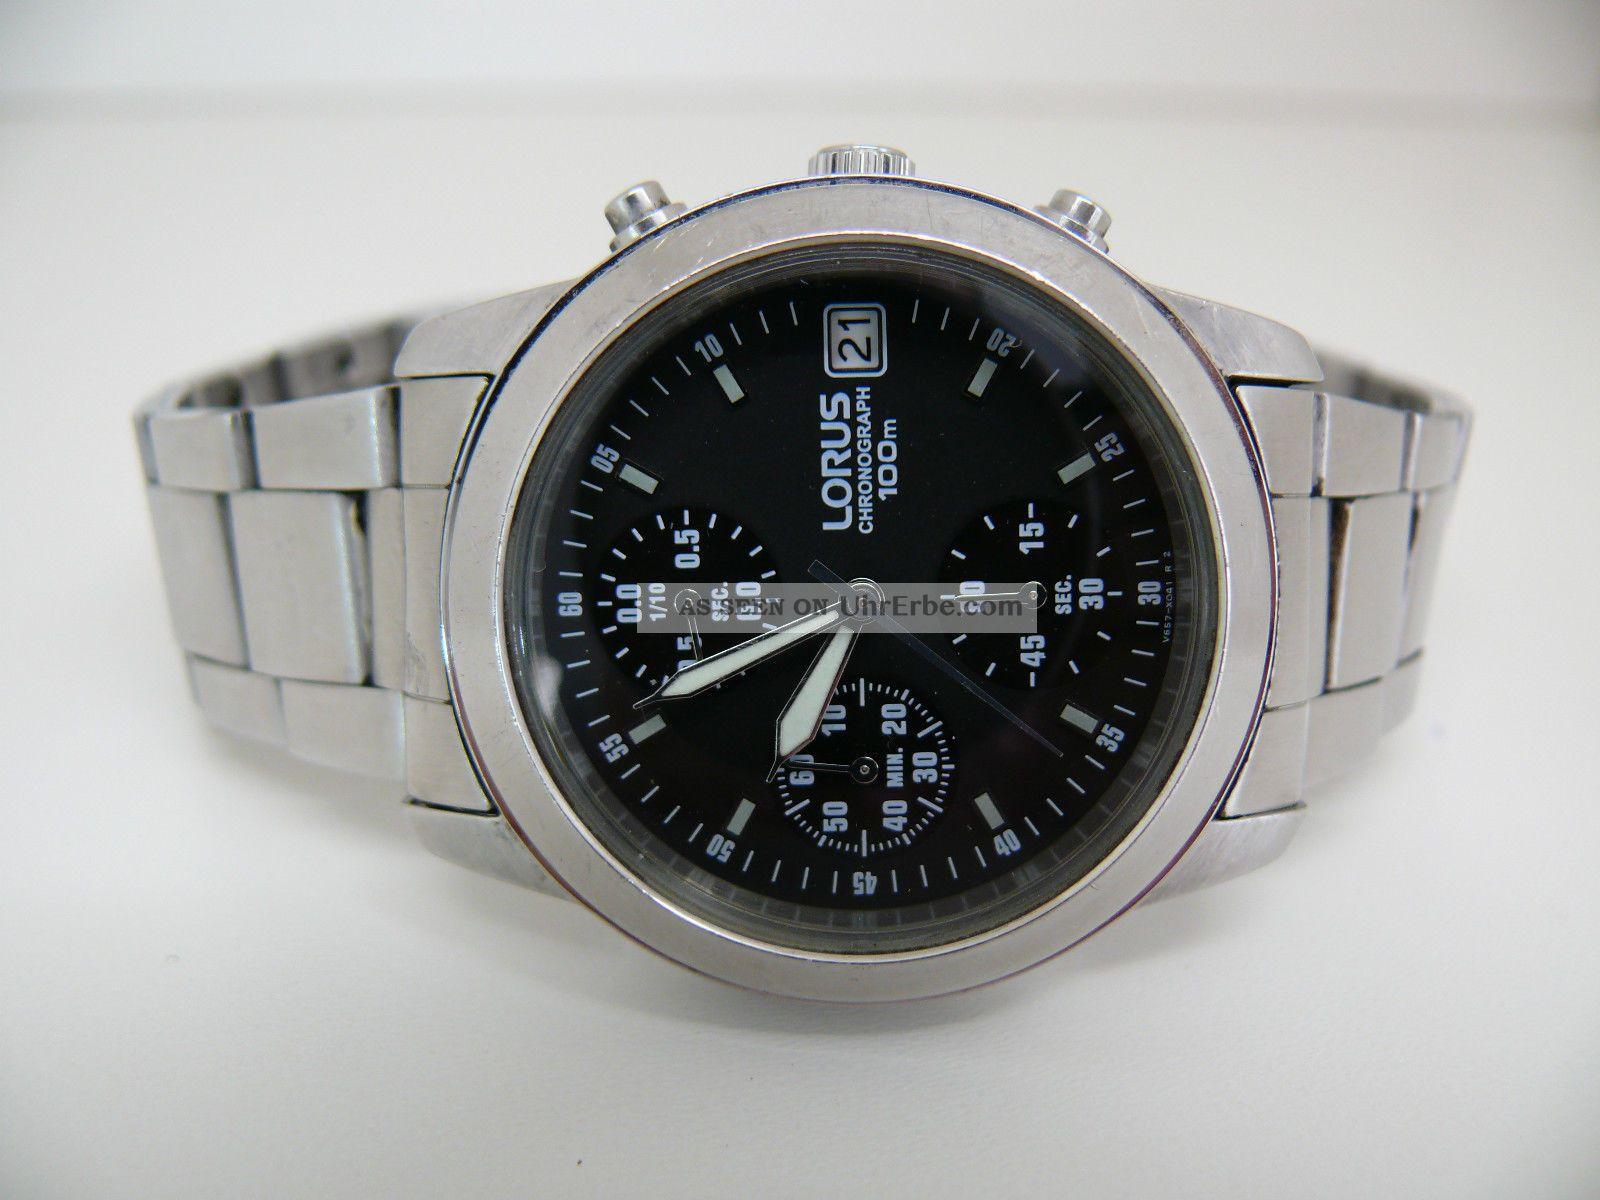 Lorus V657 - X052 Herren Flieger Armbanduhr 10 Atm Wr Seiko Werk Aviator Armbanduhren Bild